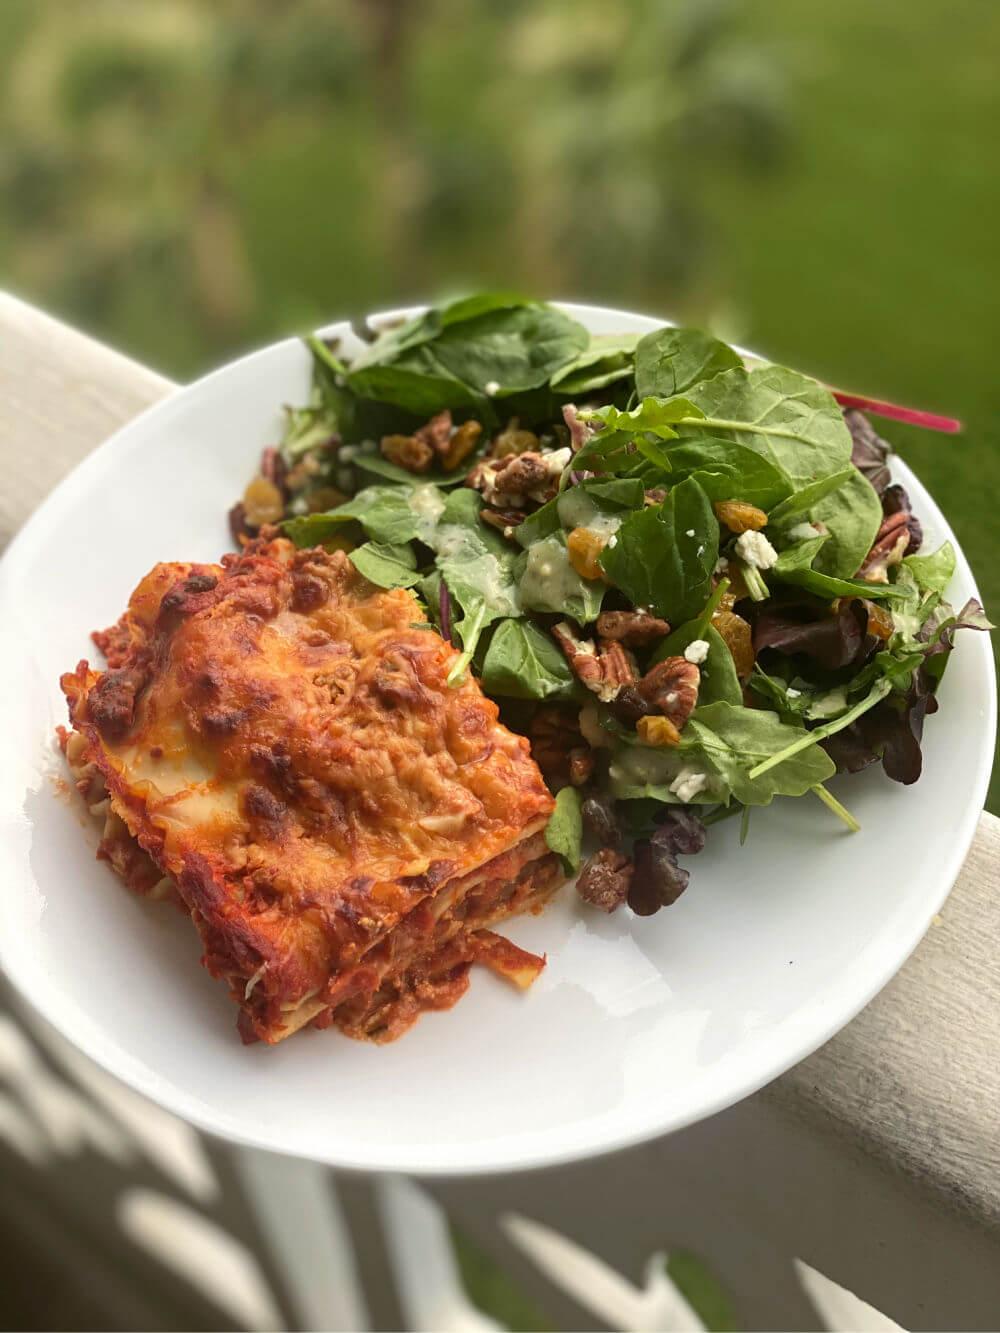 homemade lasagna